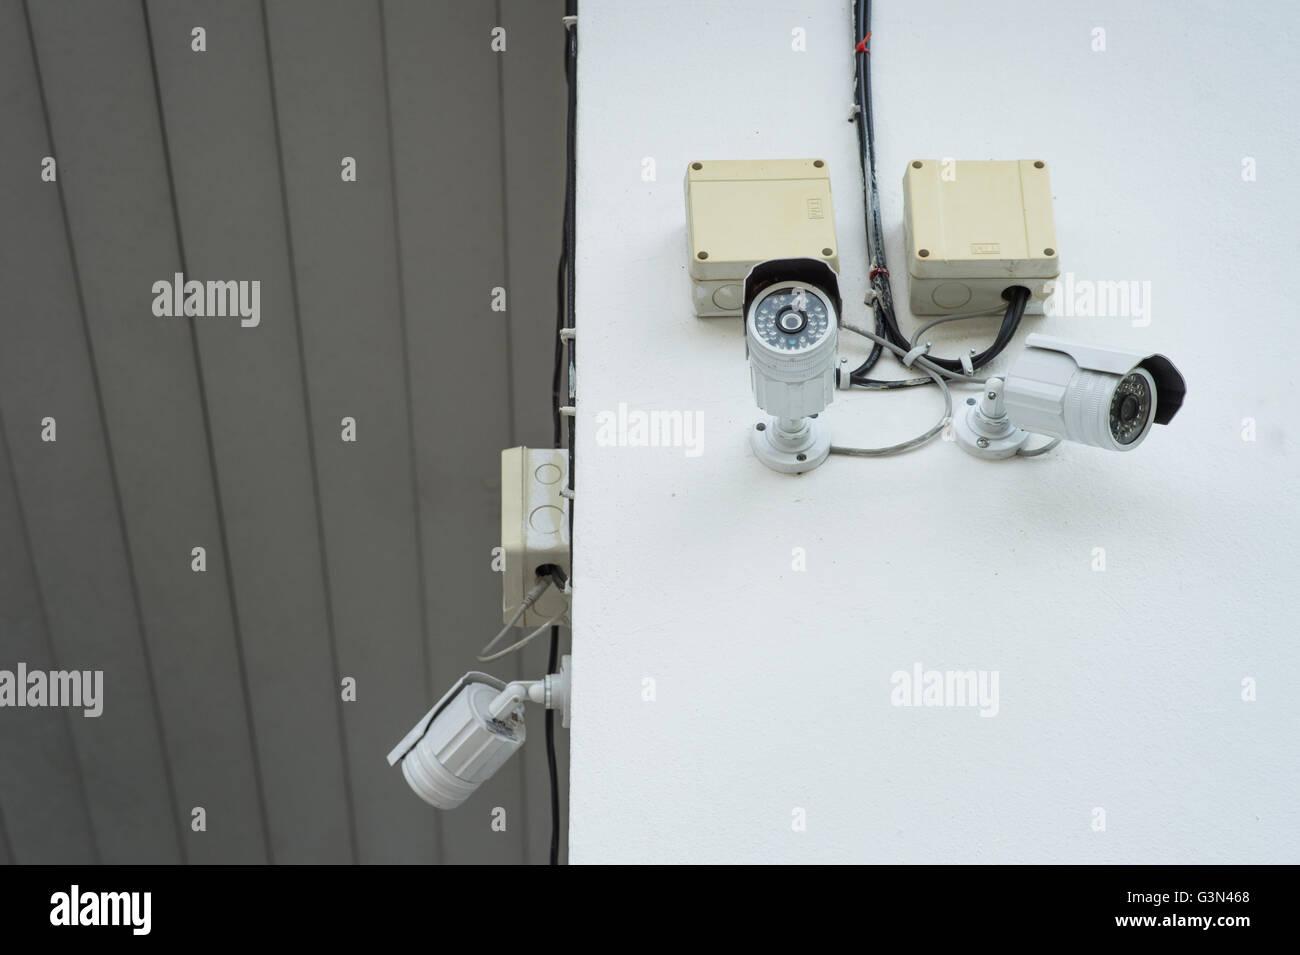 CCTV Security Camera, Closed circuit television,surveillance camera. - Stock Image